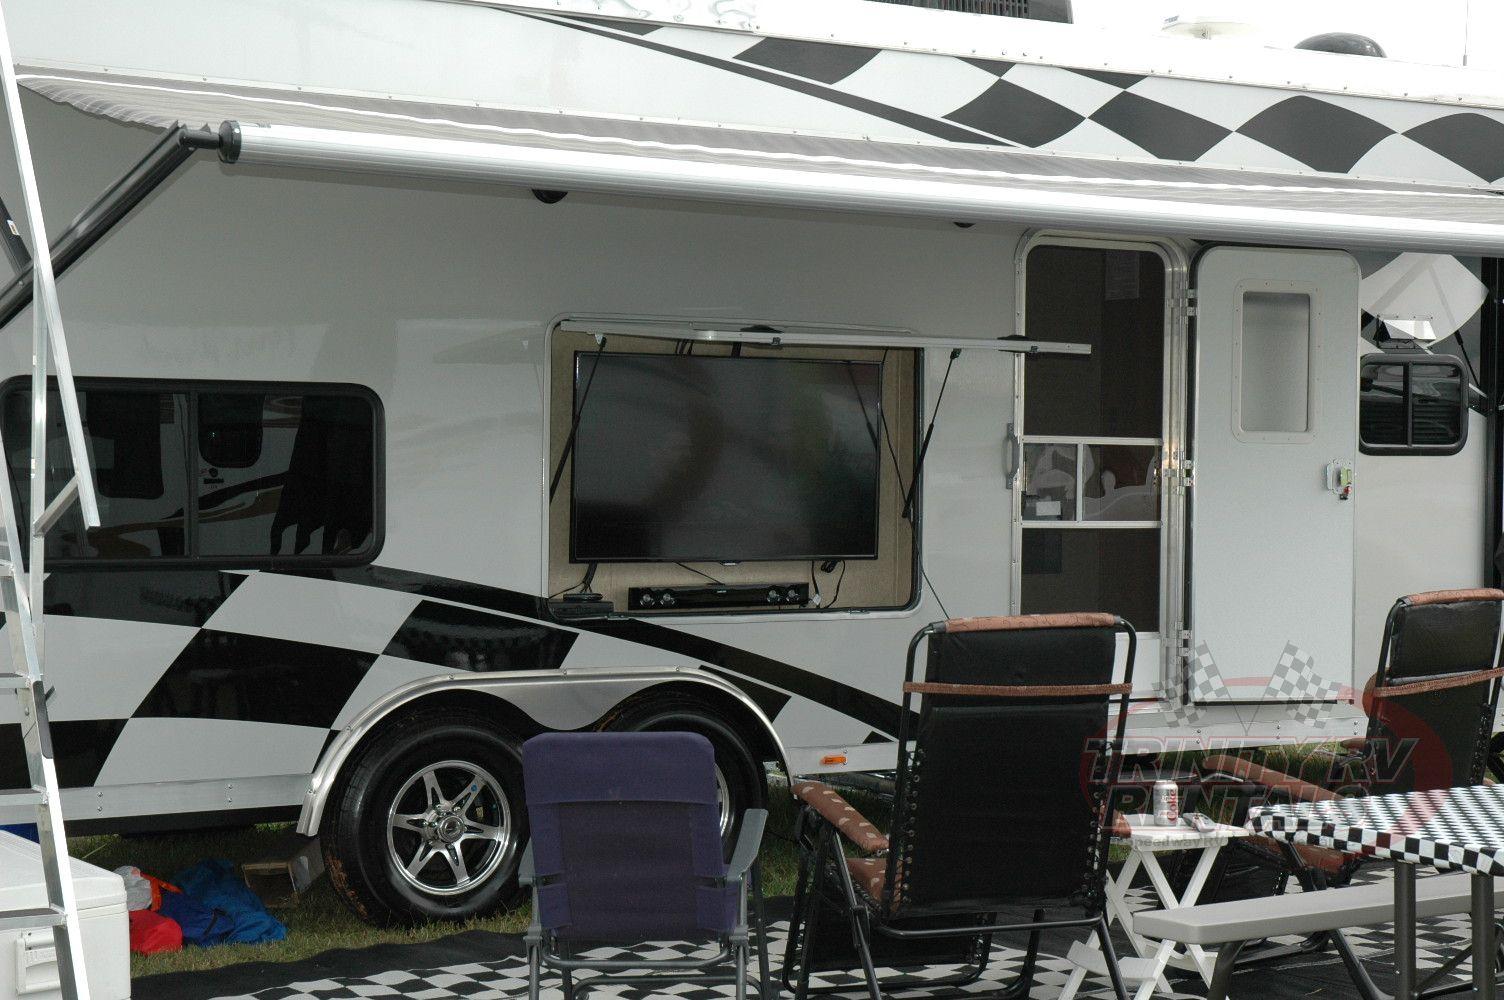 Trinity RV Rentals Updates/Specials: 2013 Daytona 500 RV Rentals